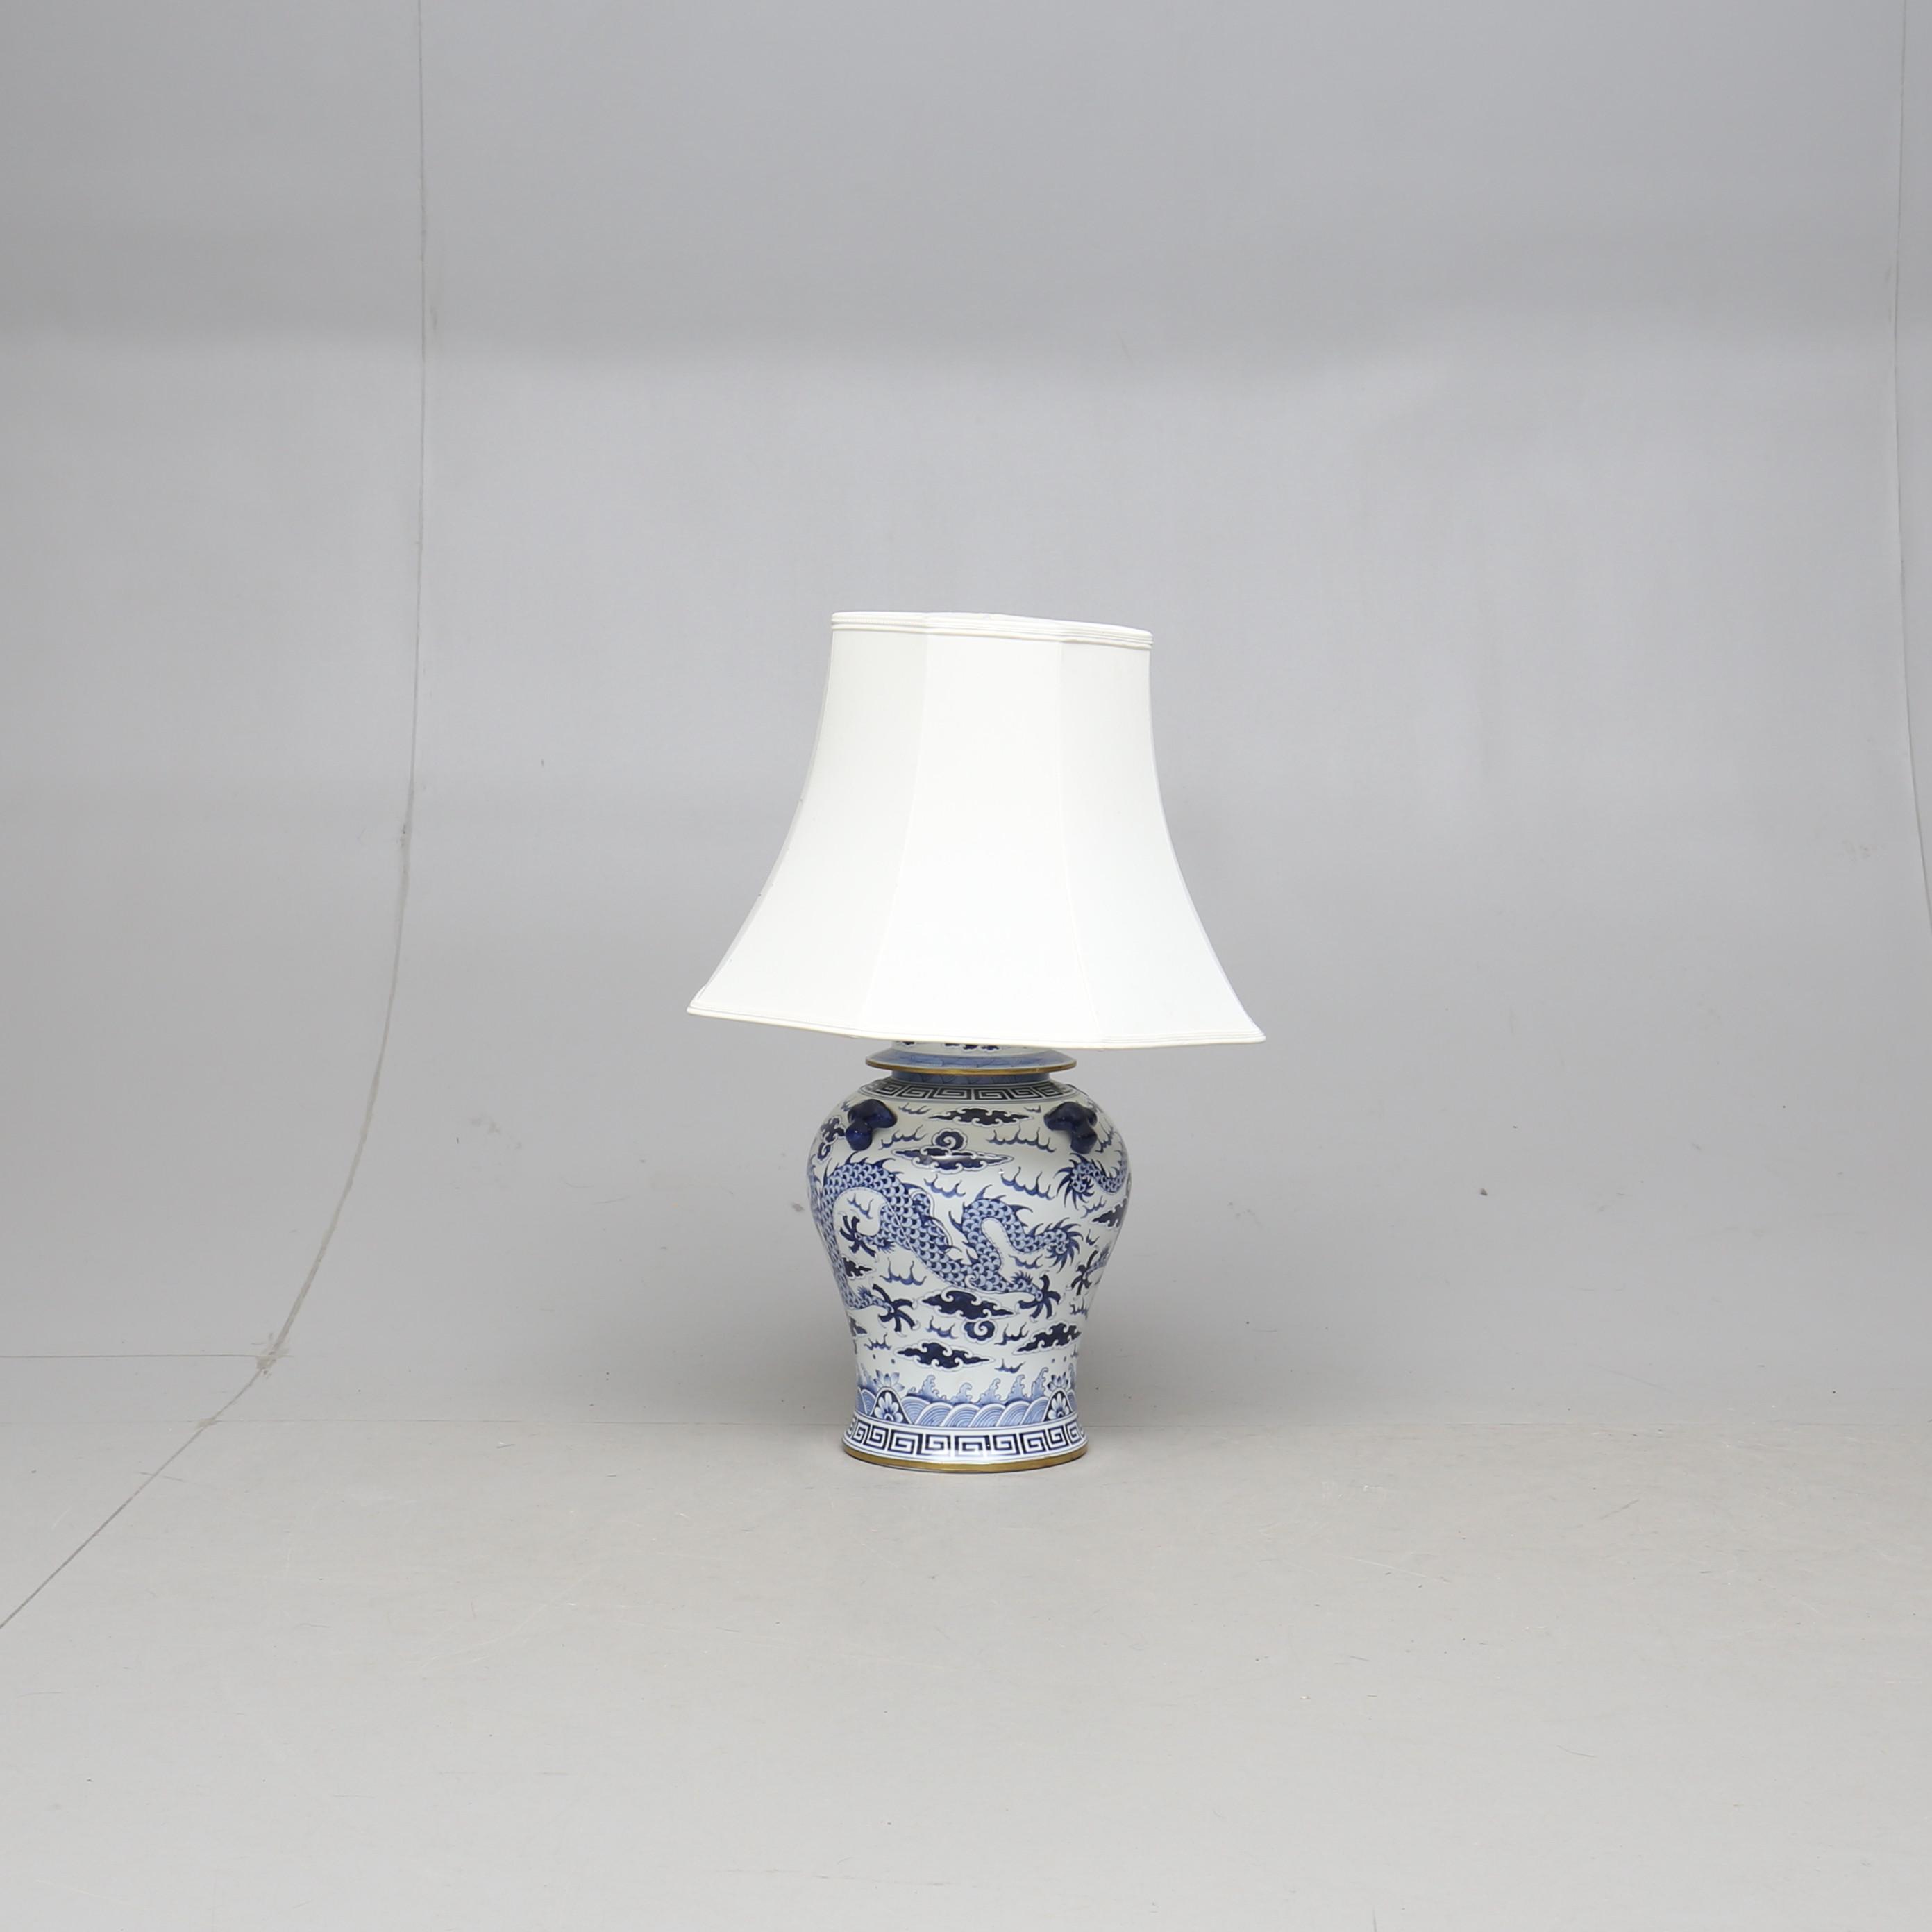 BORDSLAMPA, porslin, Kina, 2000 tal. Belysning & Lampor